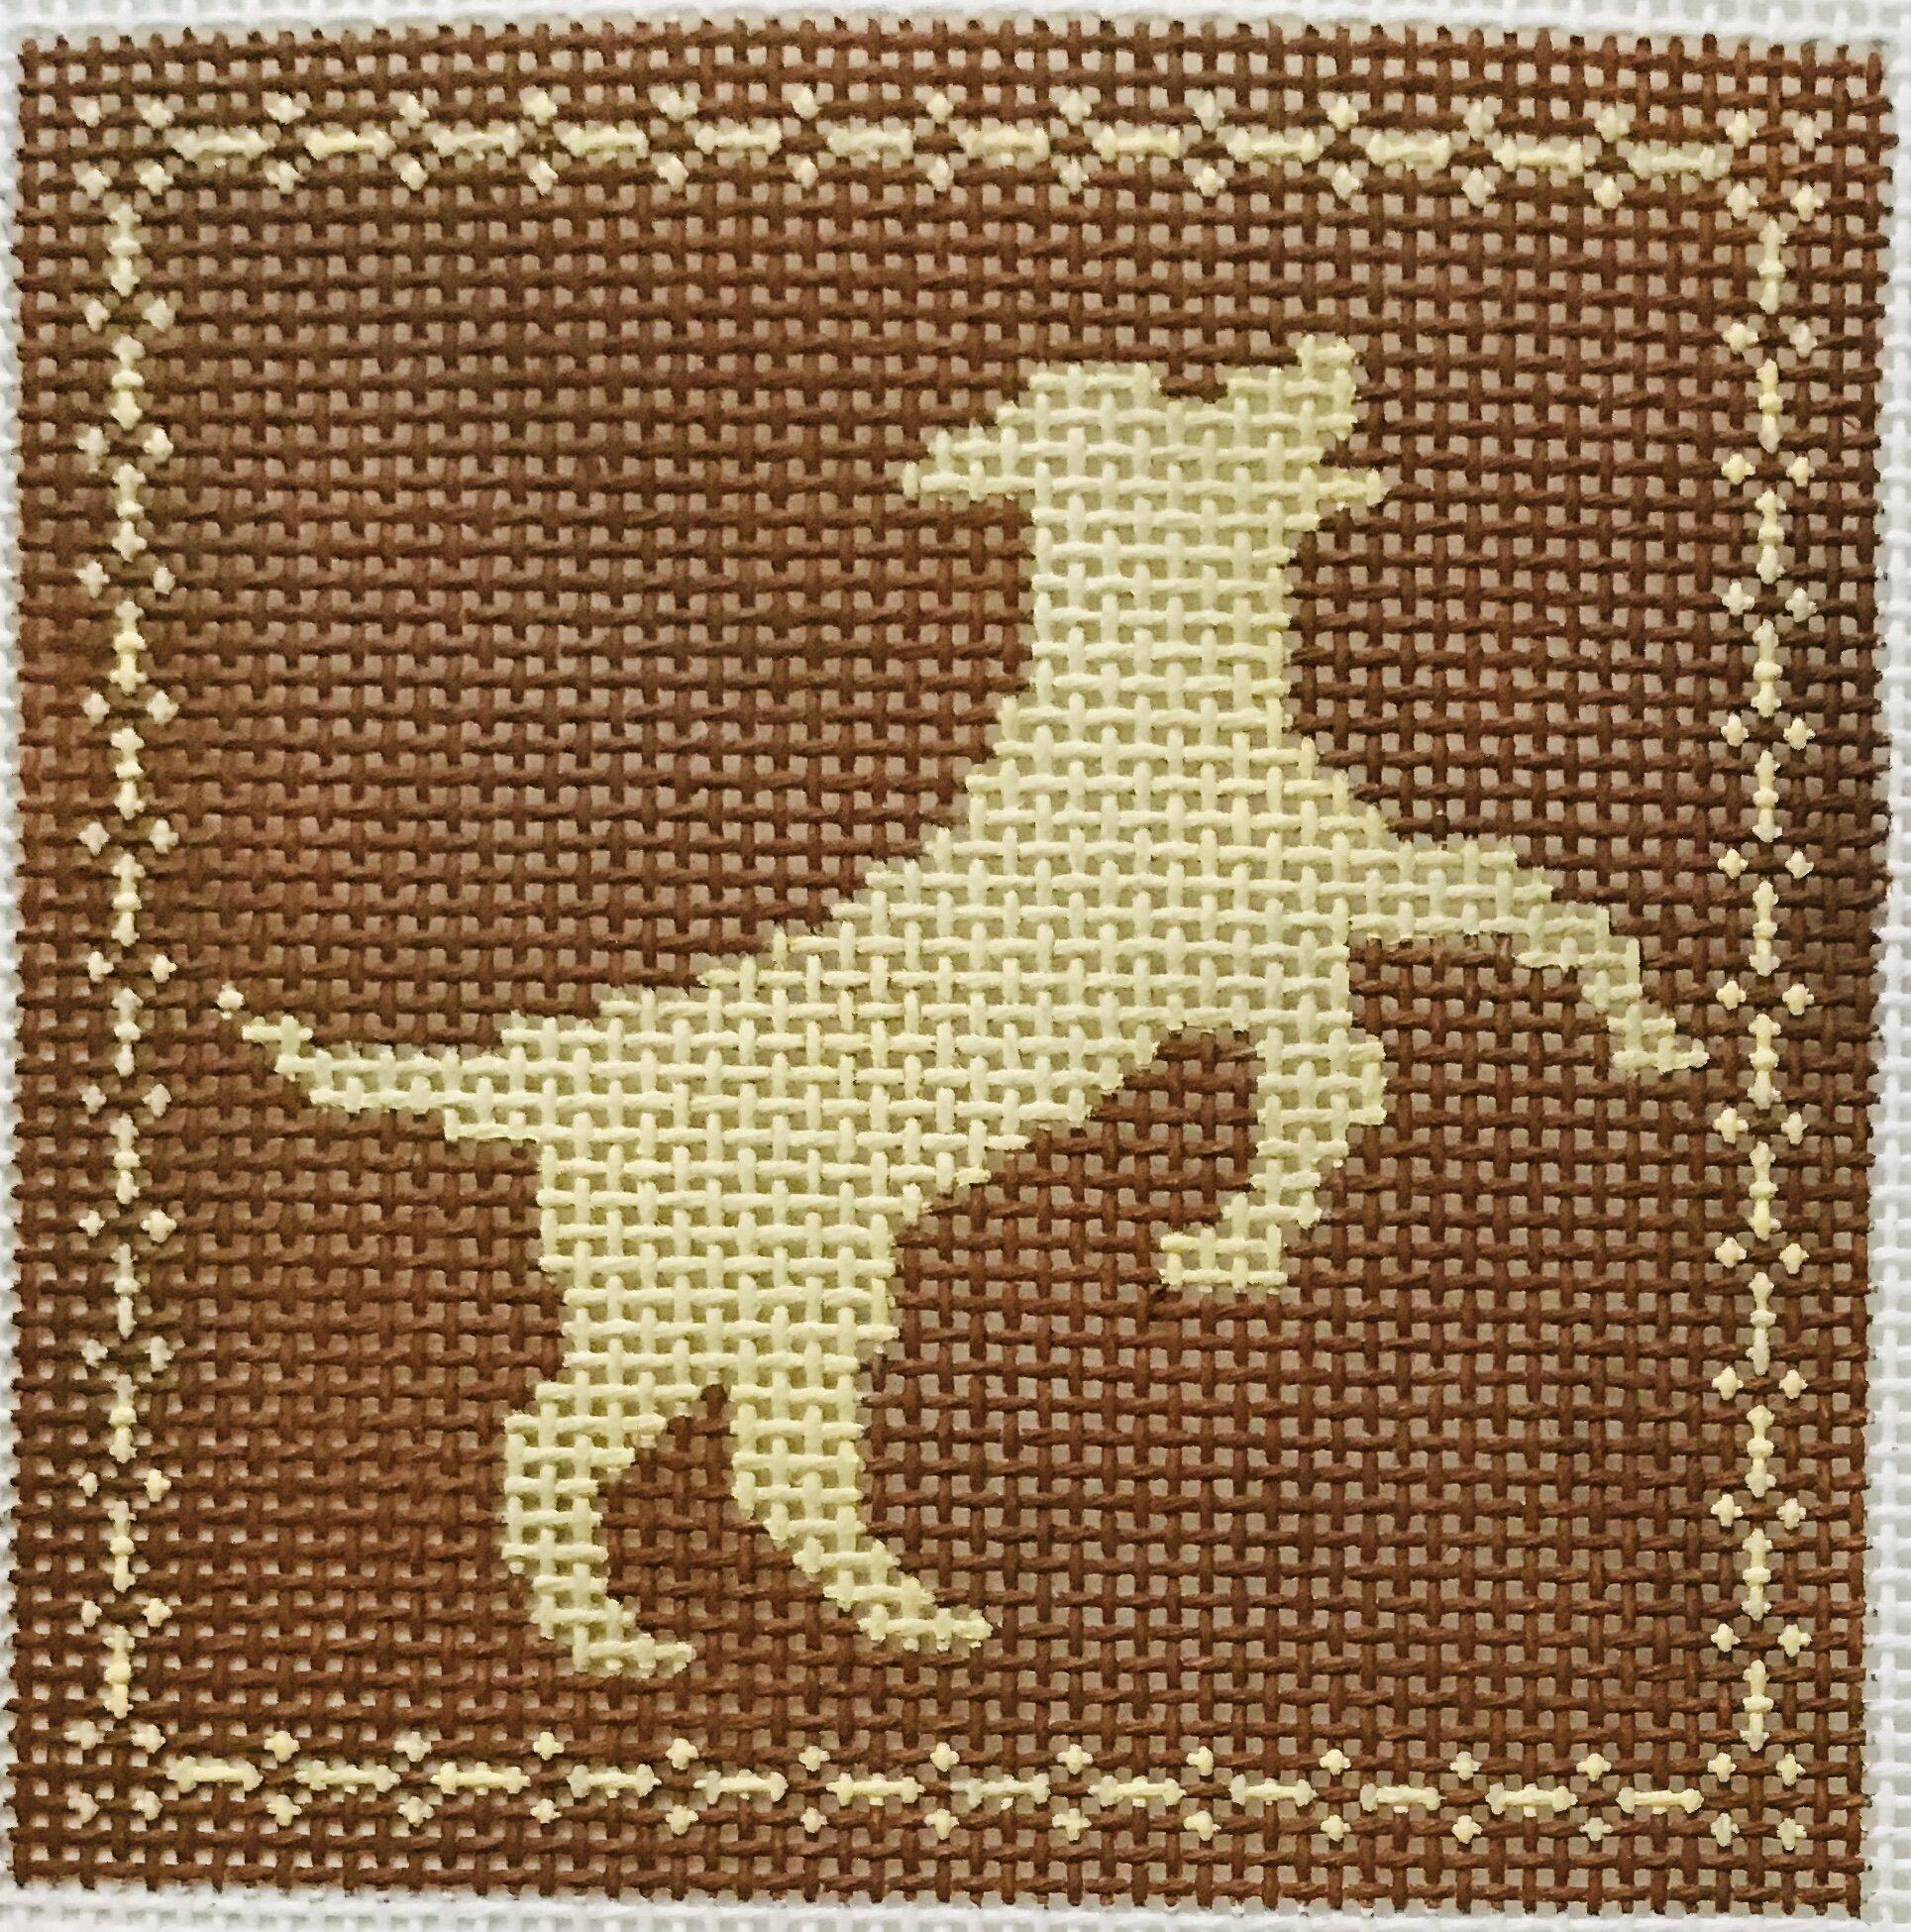 "Leaping Labrador AL104   4"" x 4"" on 14 mesh"